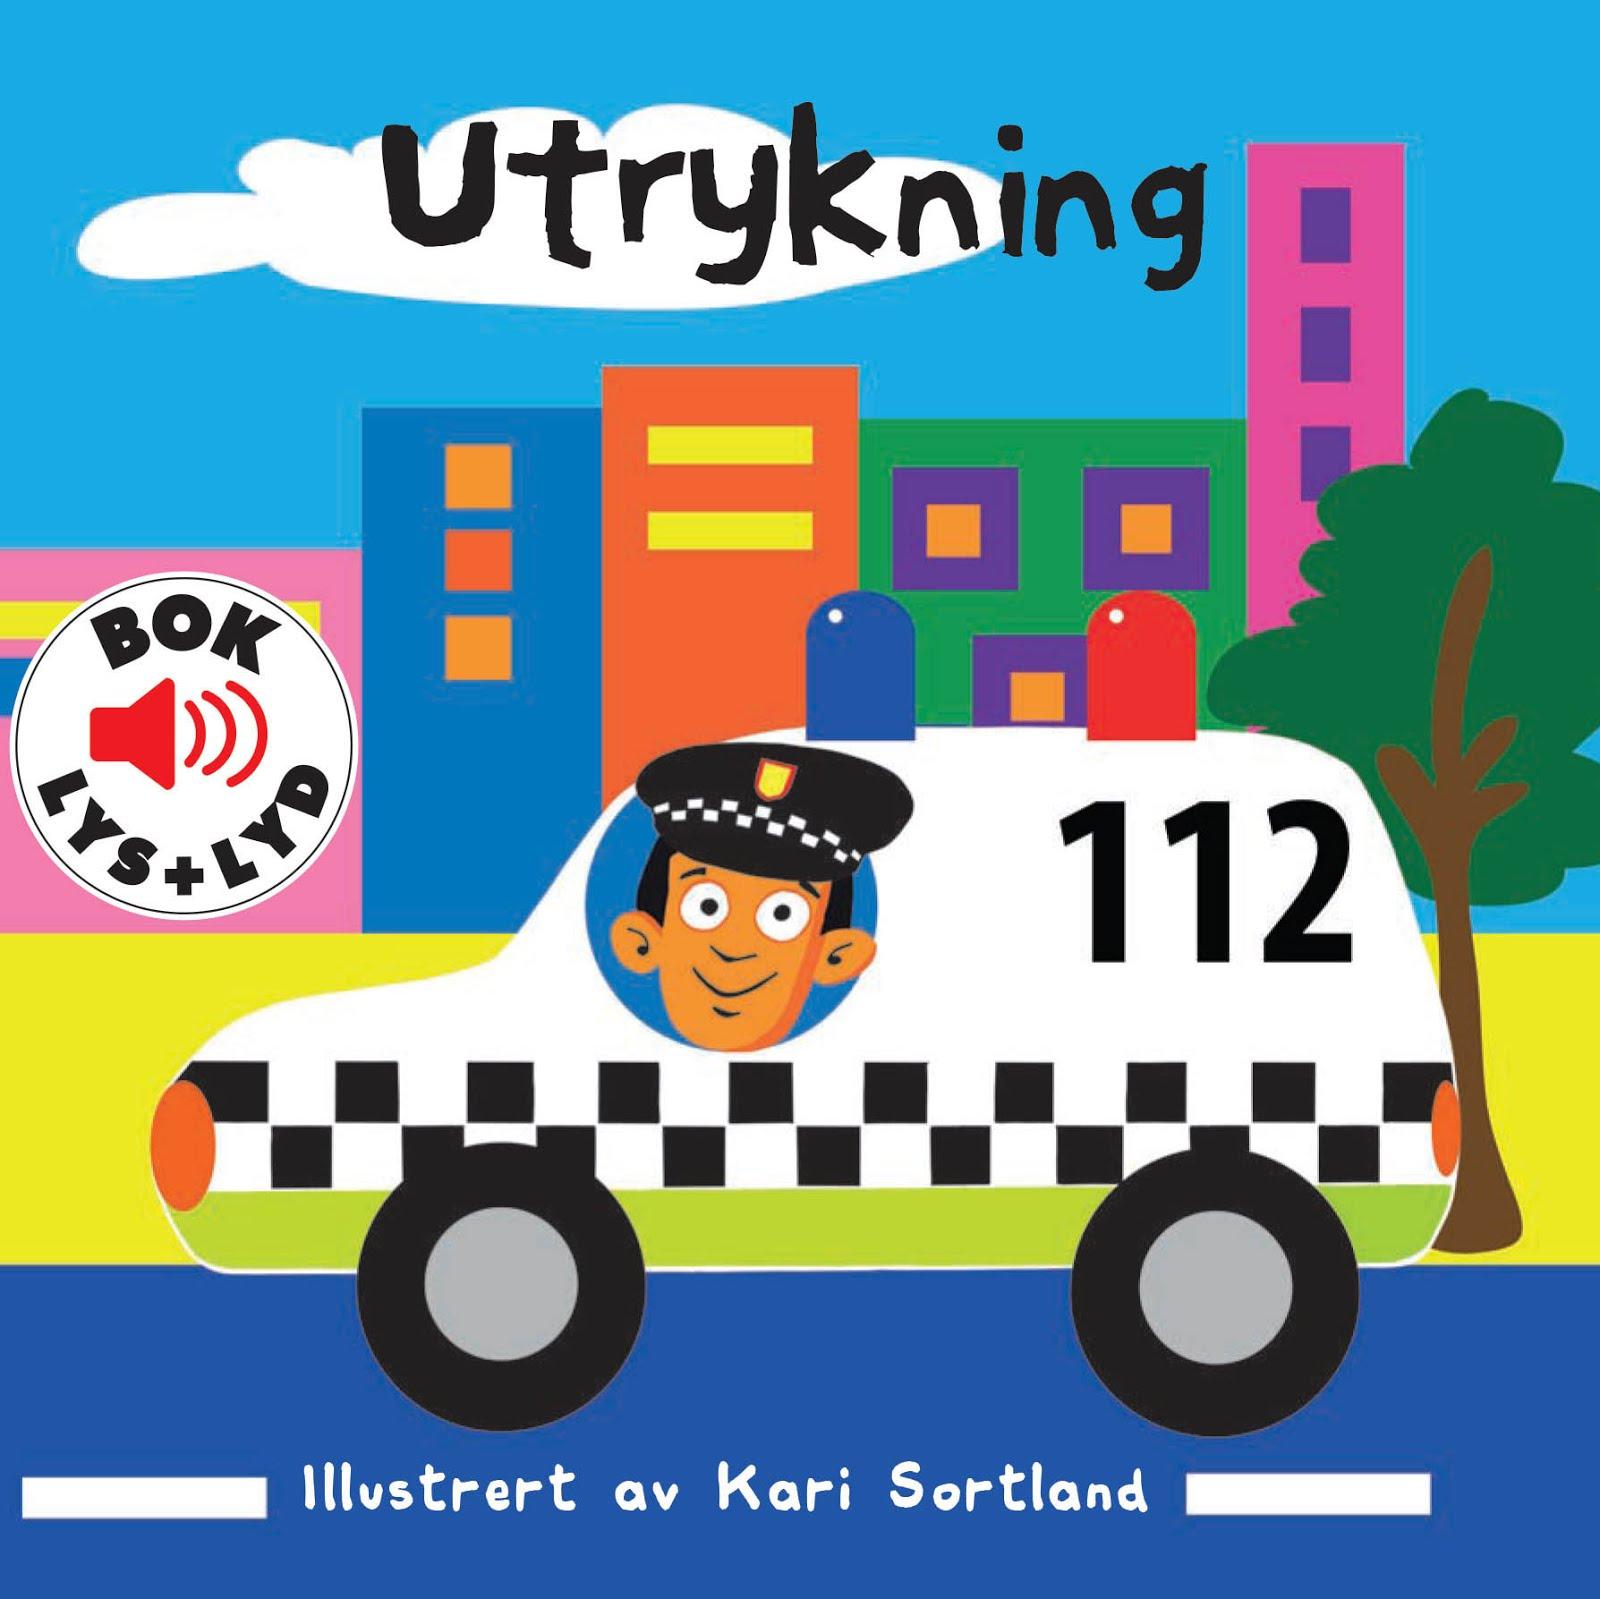 Utrykning, Kari Sortland barnebok illustrasjon